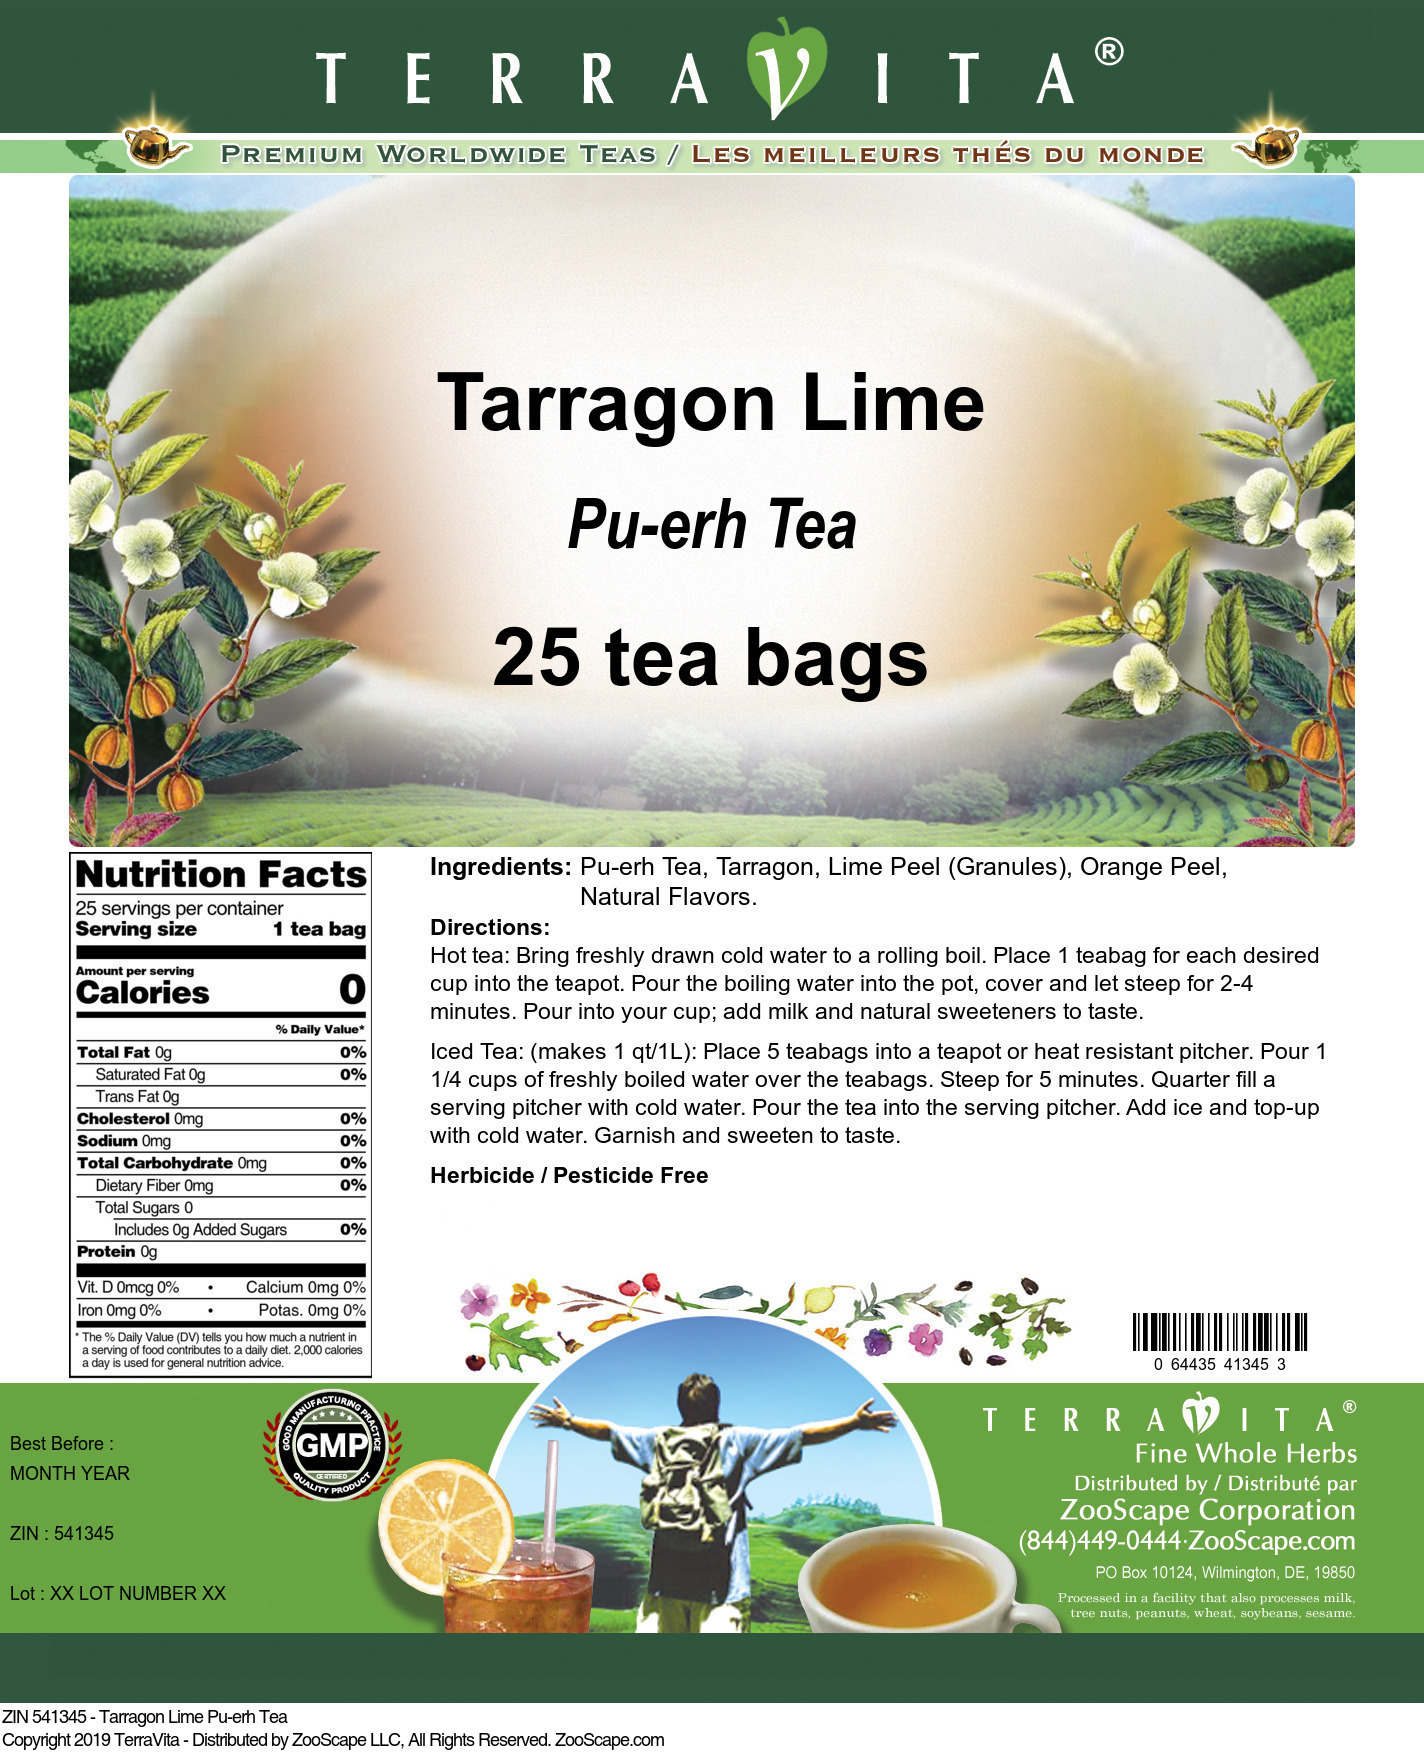 Tarragon Lime Pu-erh Tea